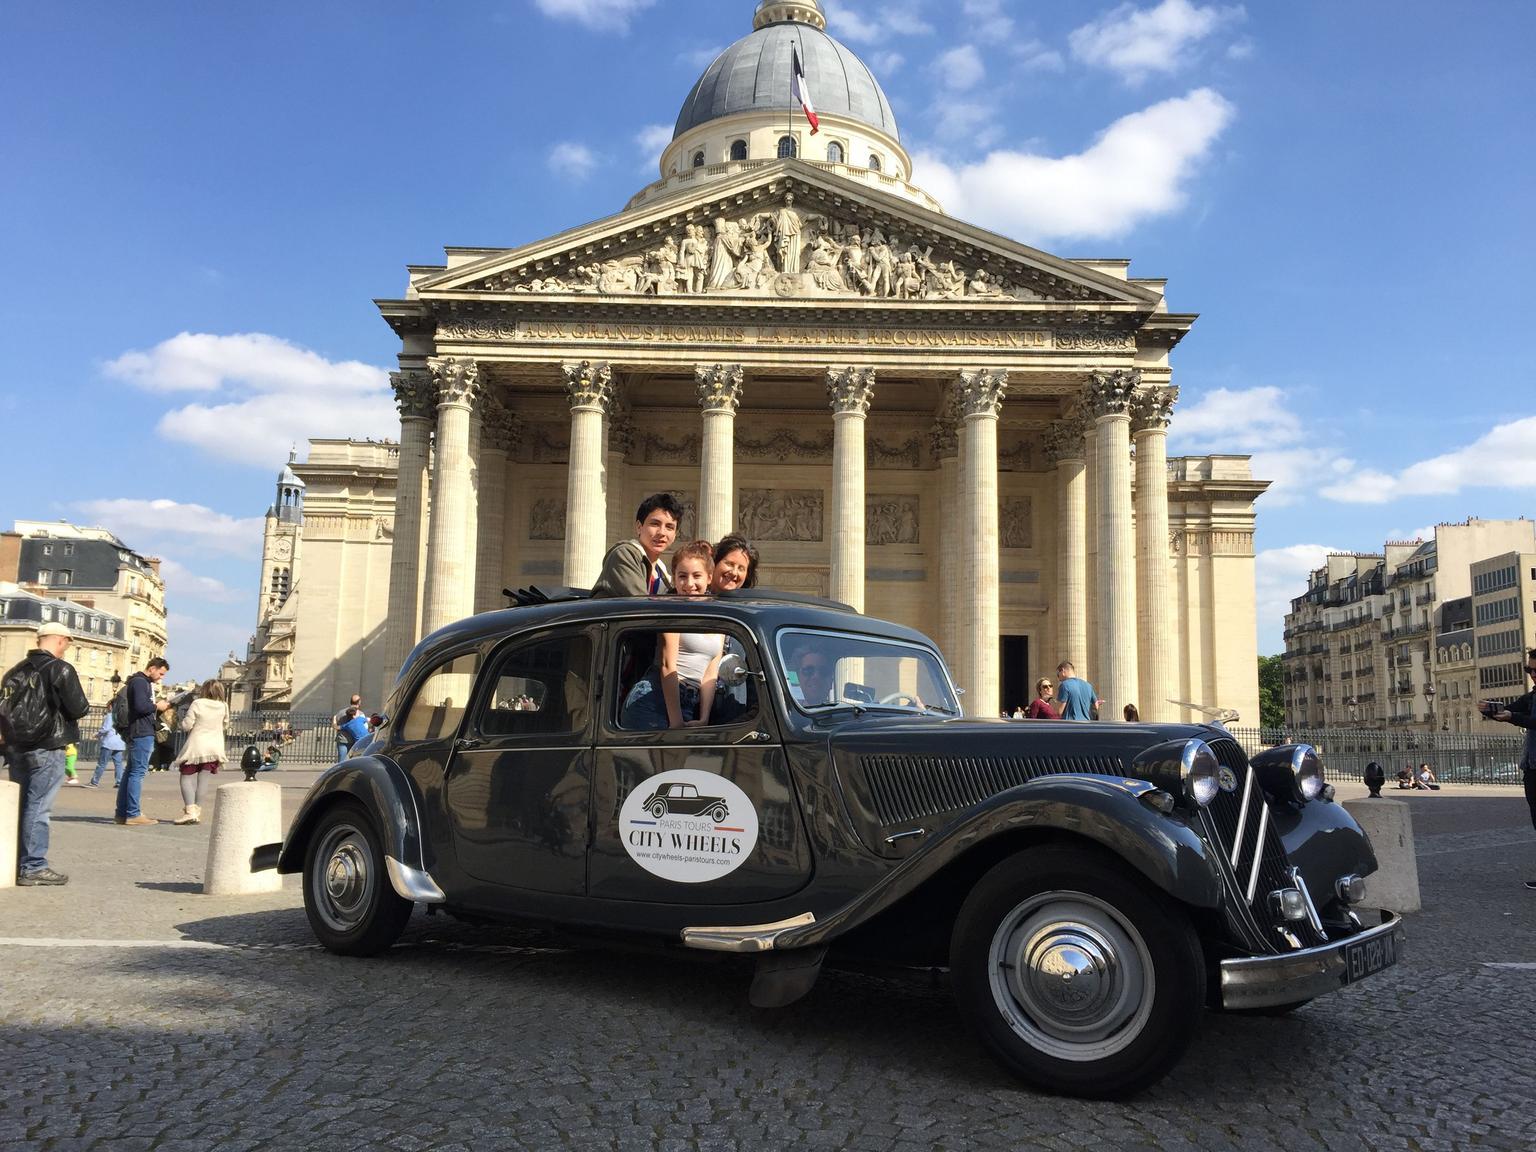 MORE PHOTOS, Paris Private Tour in Classic French Citroën